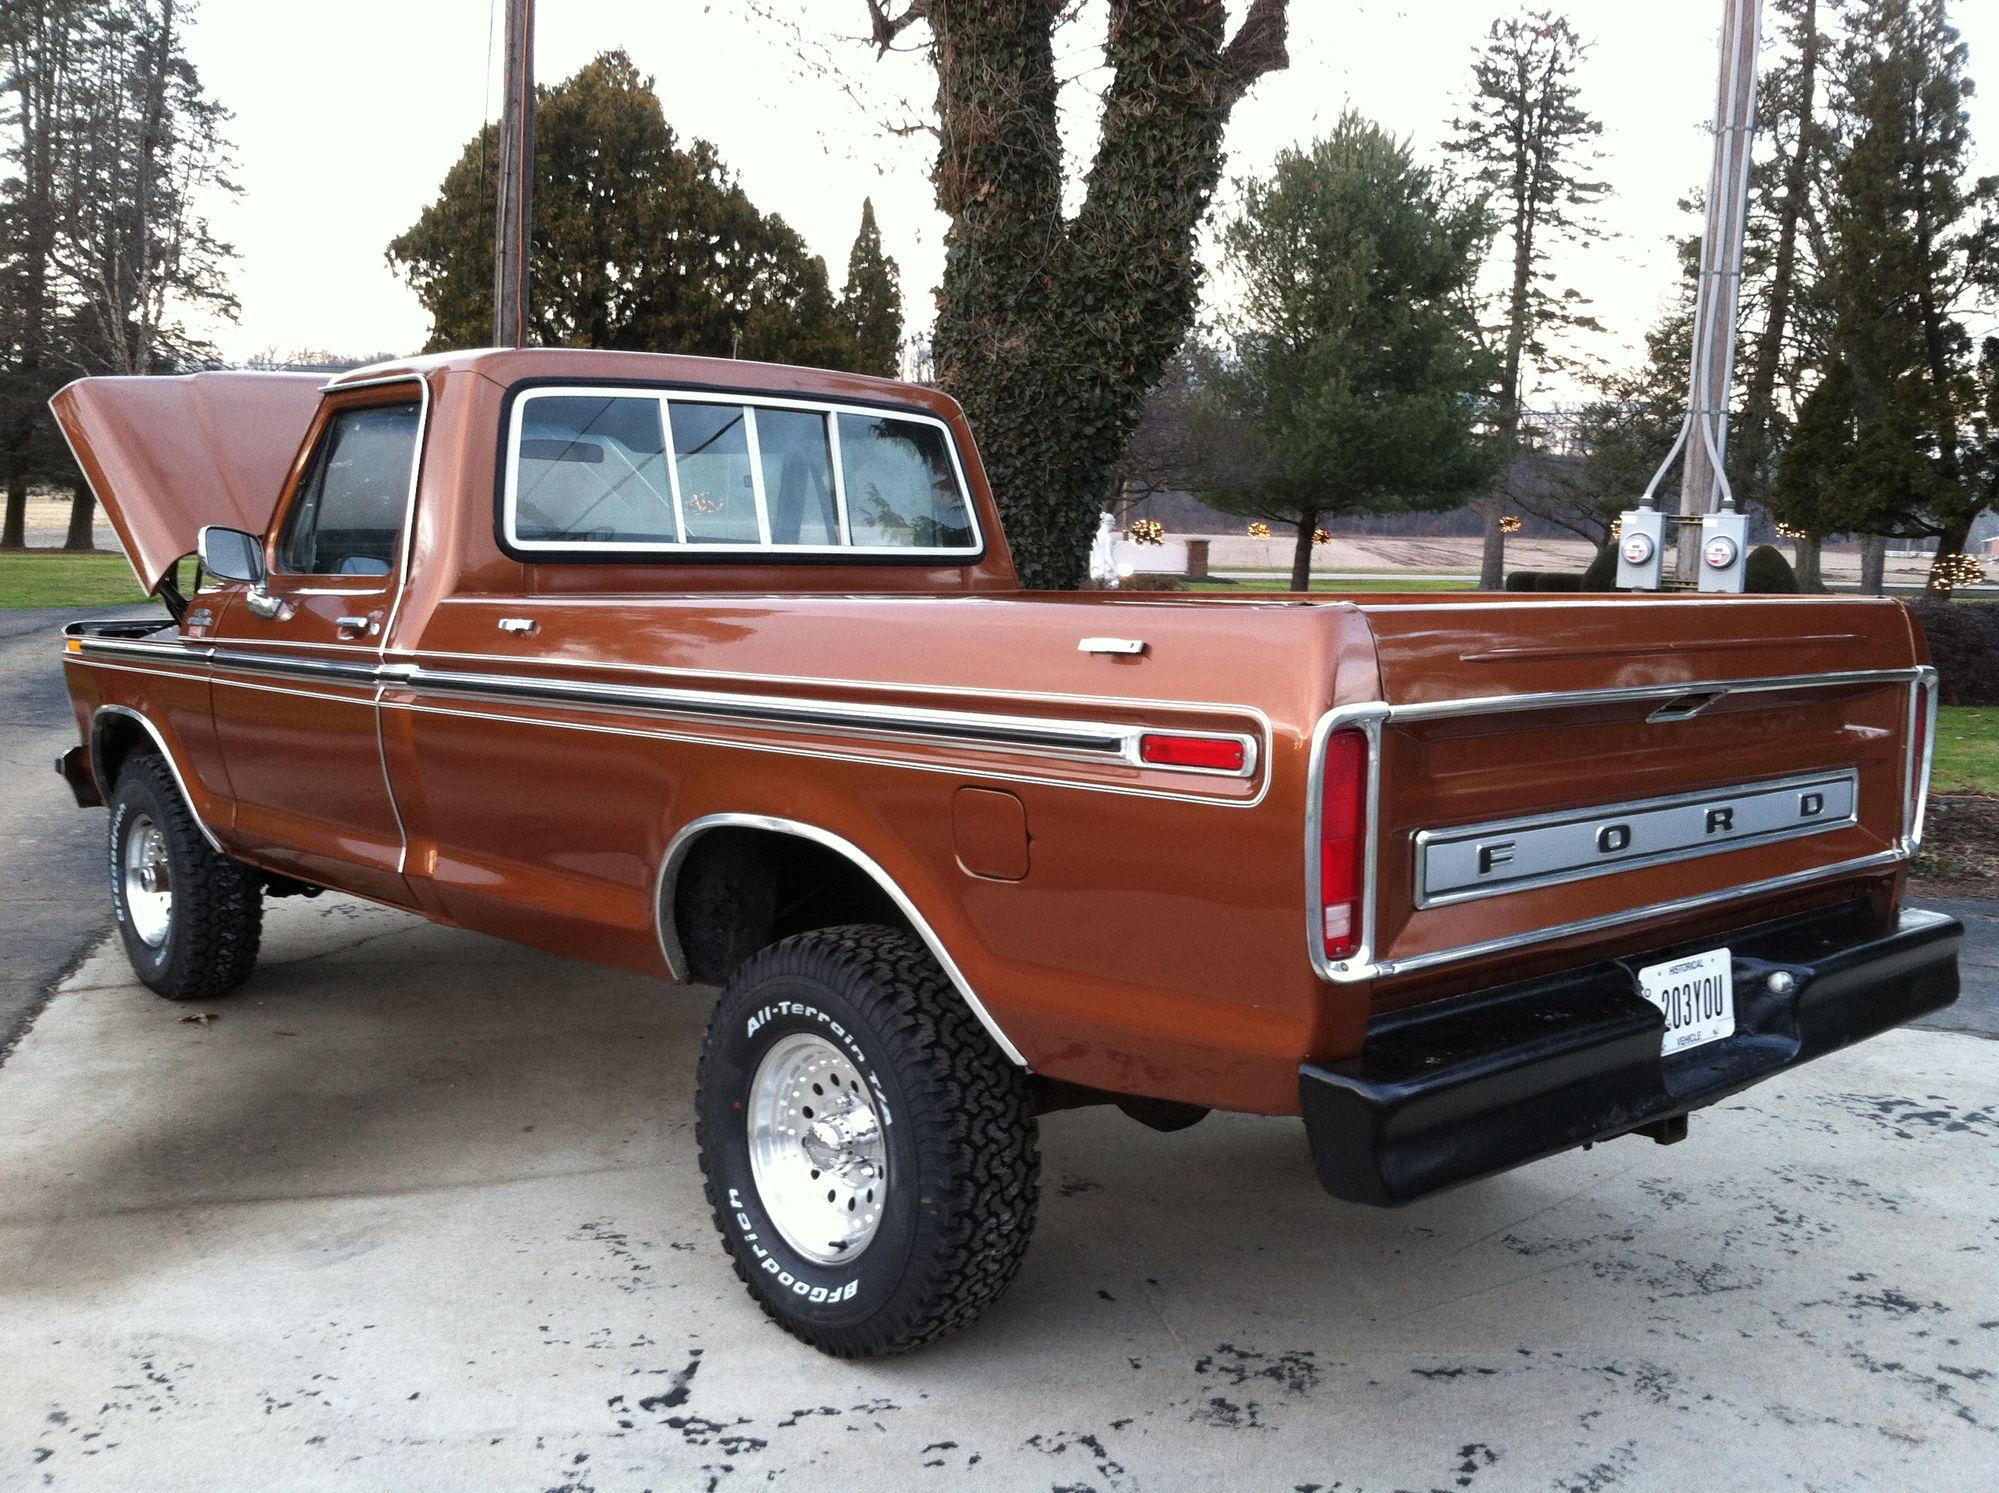 What 4x4 Should I Keep 1978 F150 1977 F250 Ford Truck